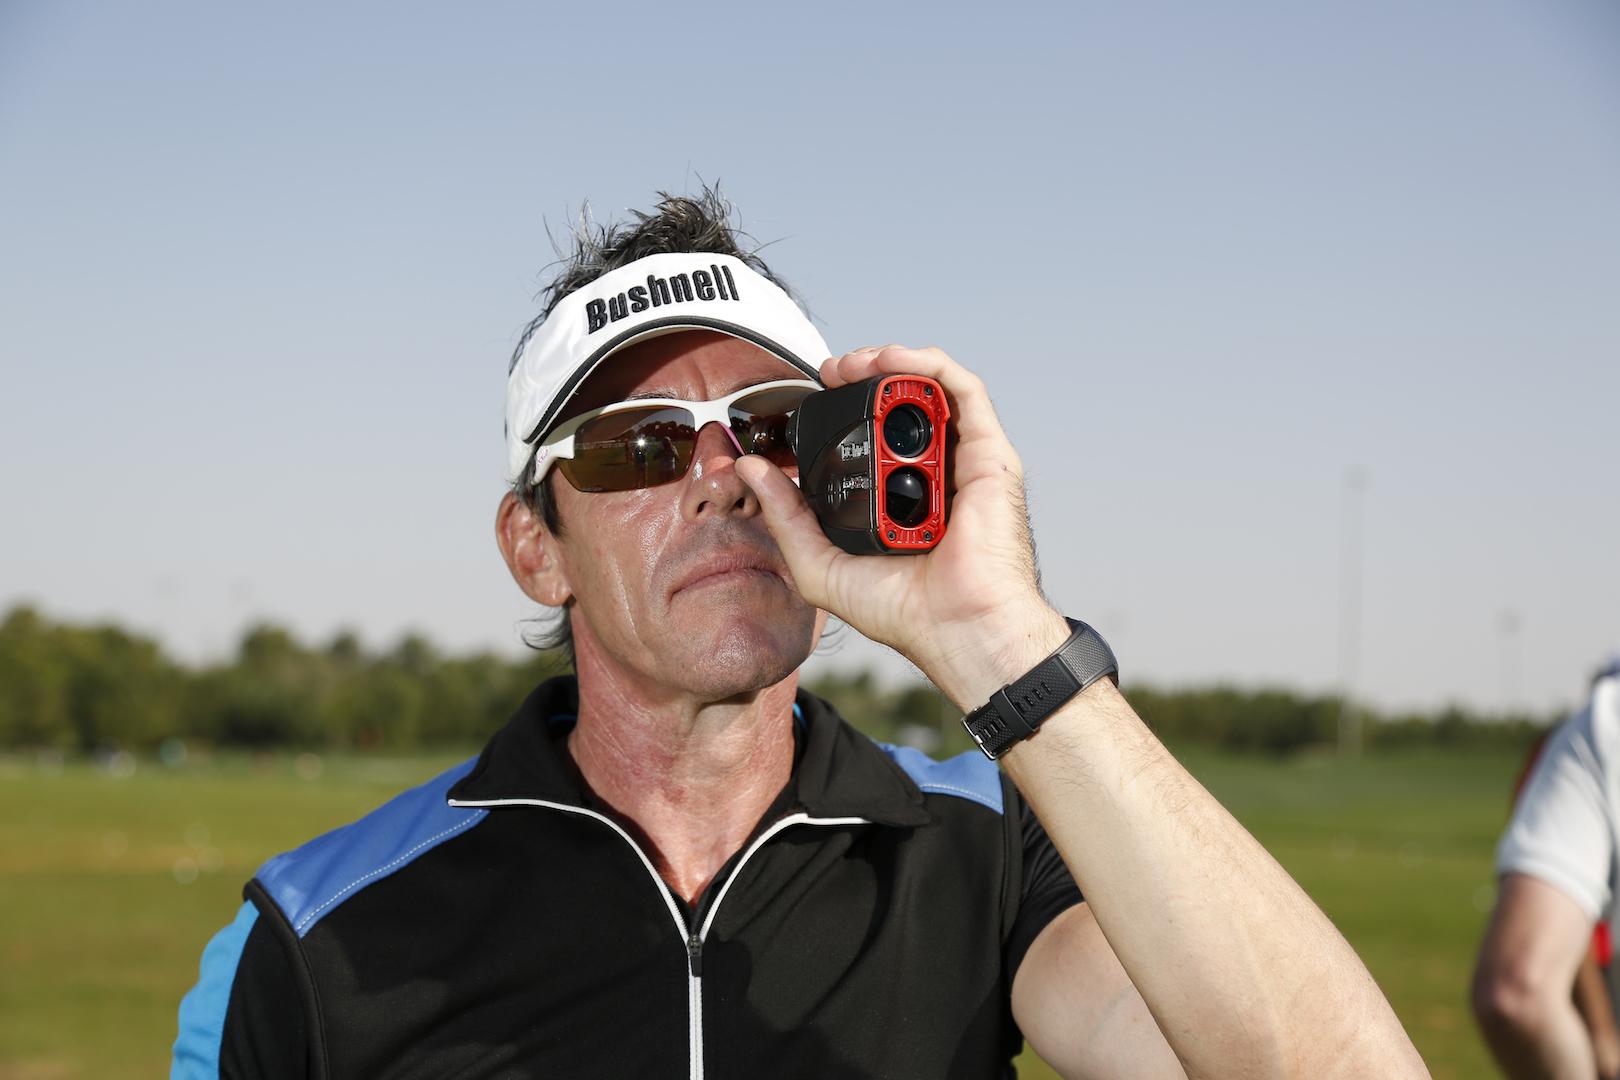 Bushnell partners with 5 European Tour Caddie ambassadors